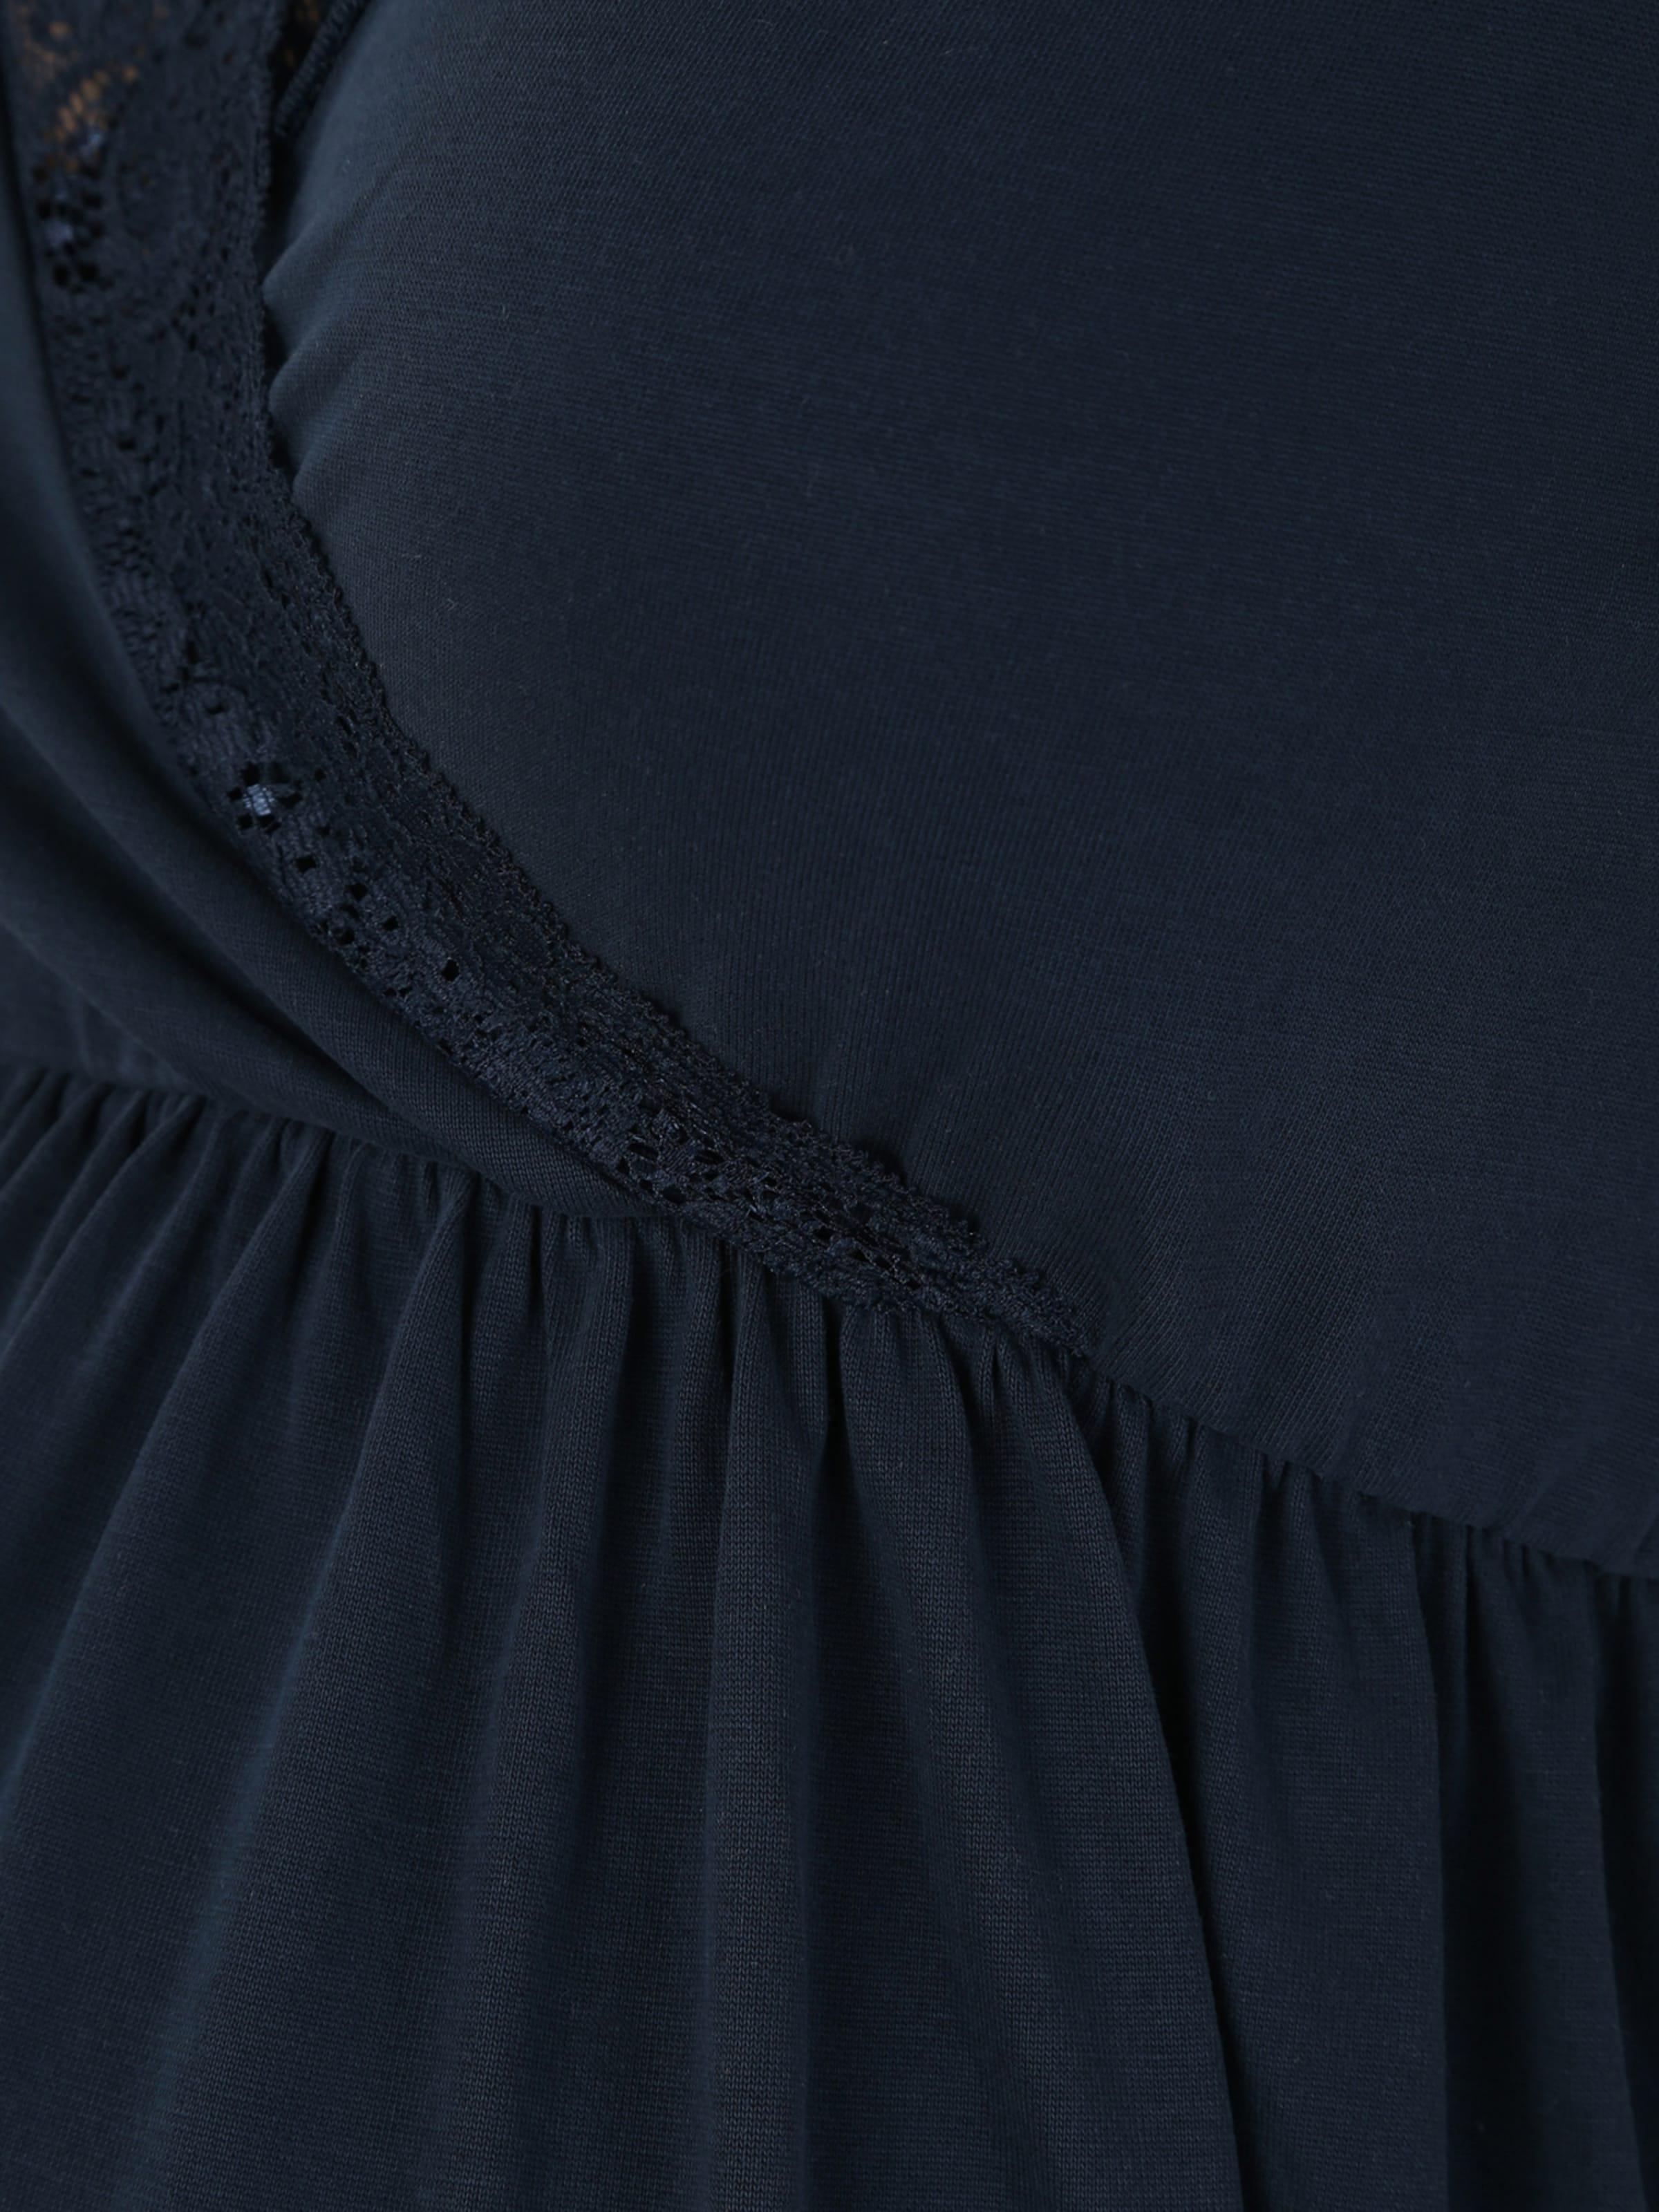 ' Jersey Nf Mamalicious 'mllulu Top En Foncé S s Tess T shirt Bleu bY7gf6yv